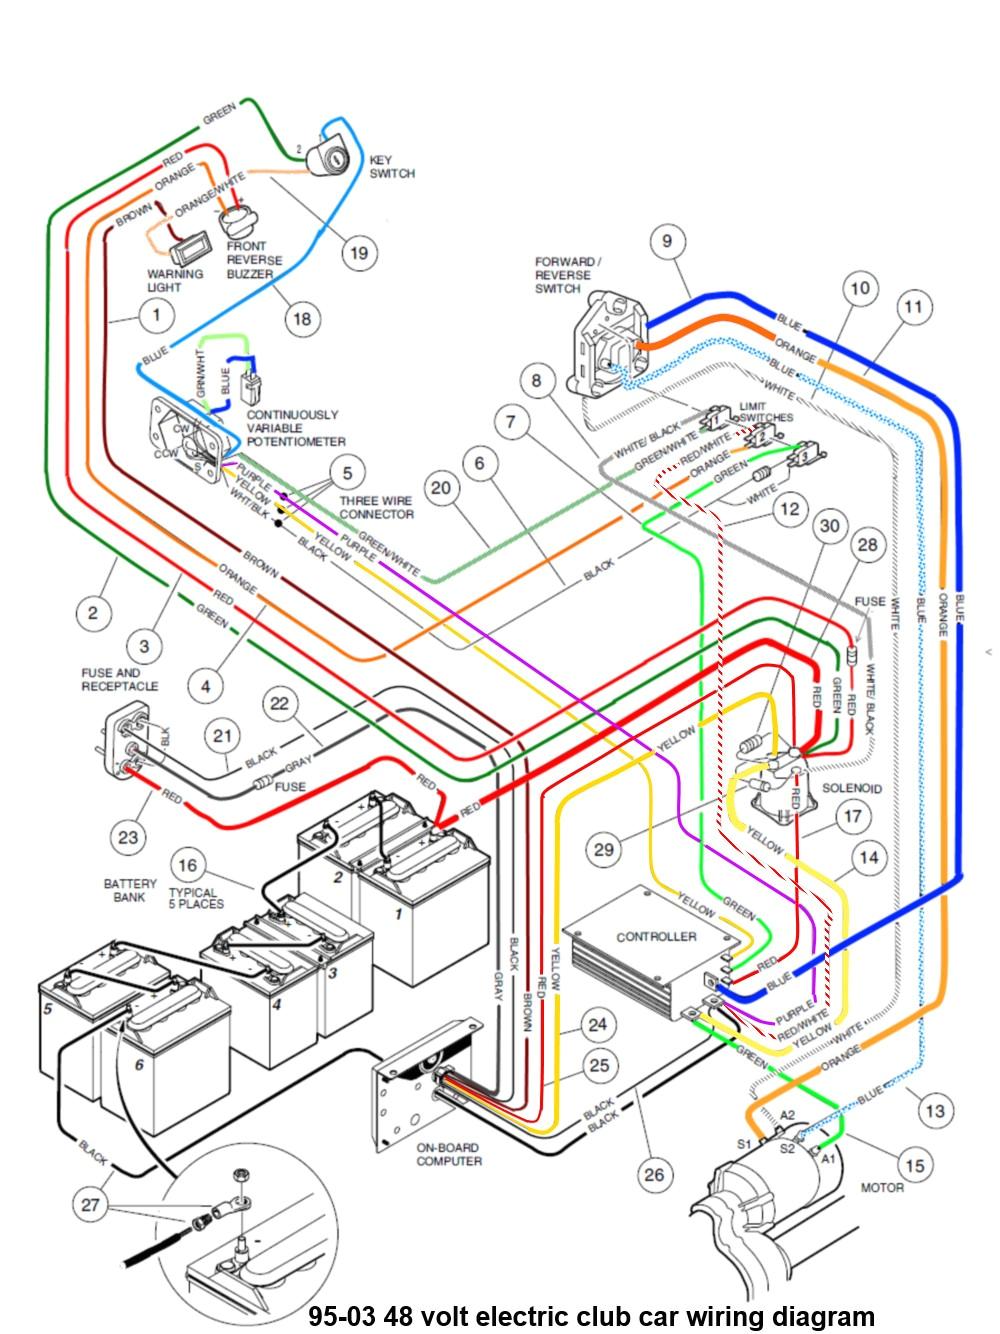 vintage golf cart wiring diagram for electric wiring diagrams second old yamaha golf cart wiring diagram